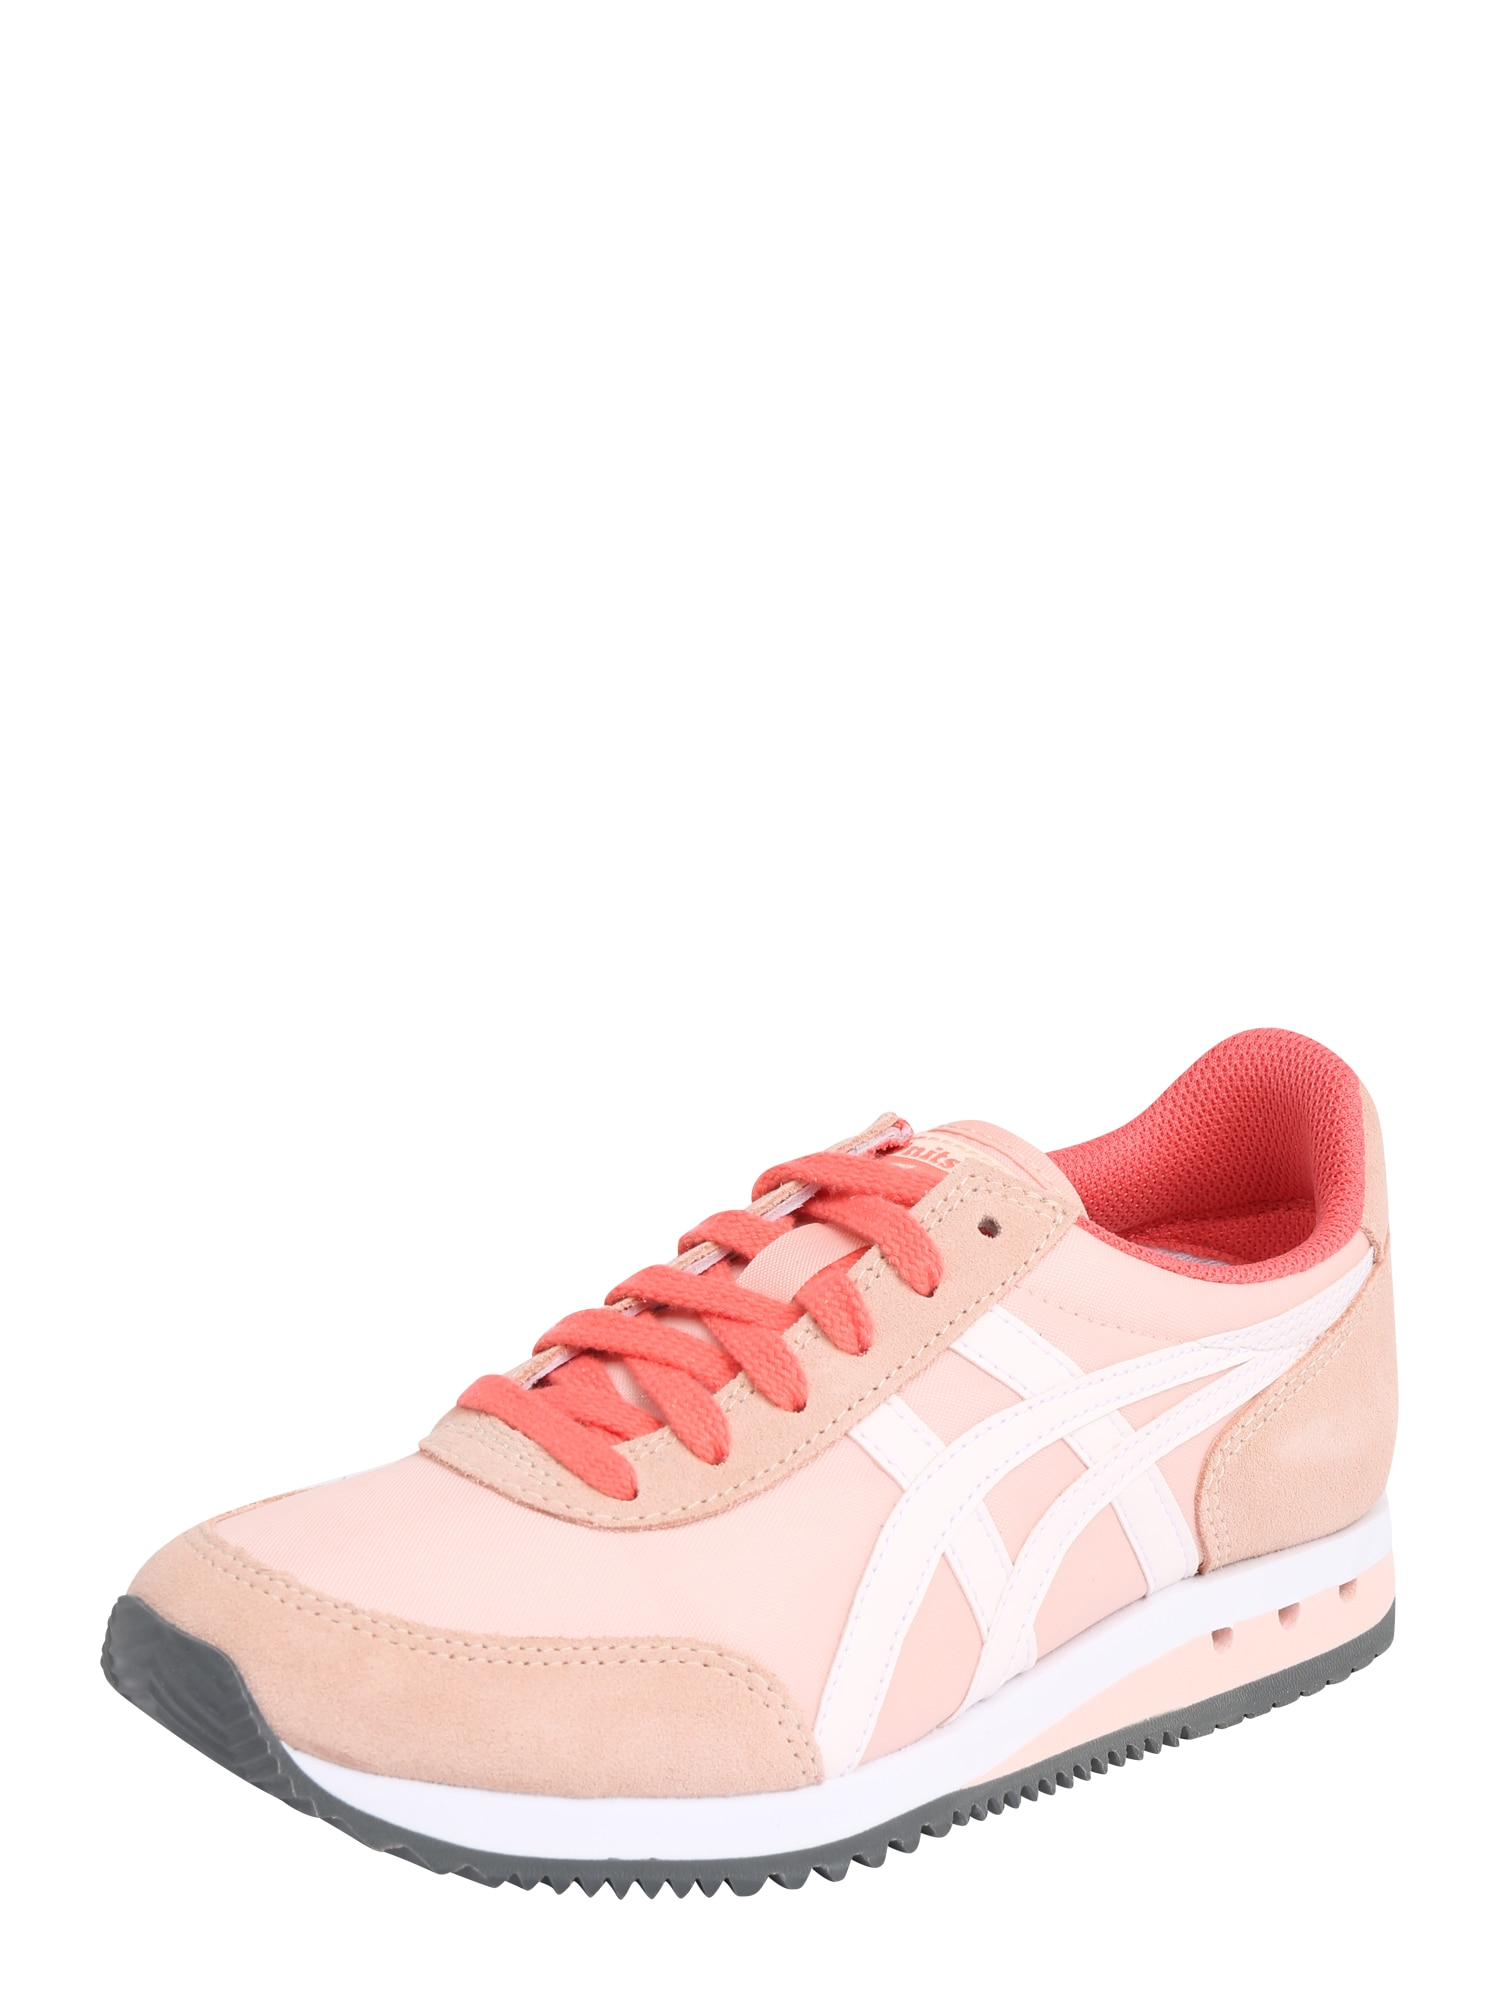 Tenisky New York růžová bílá Onitsuka Tiger